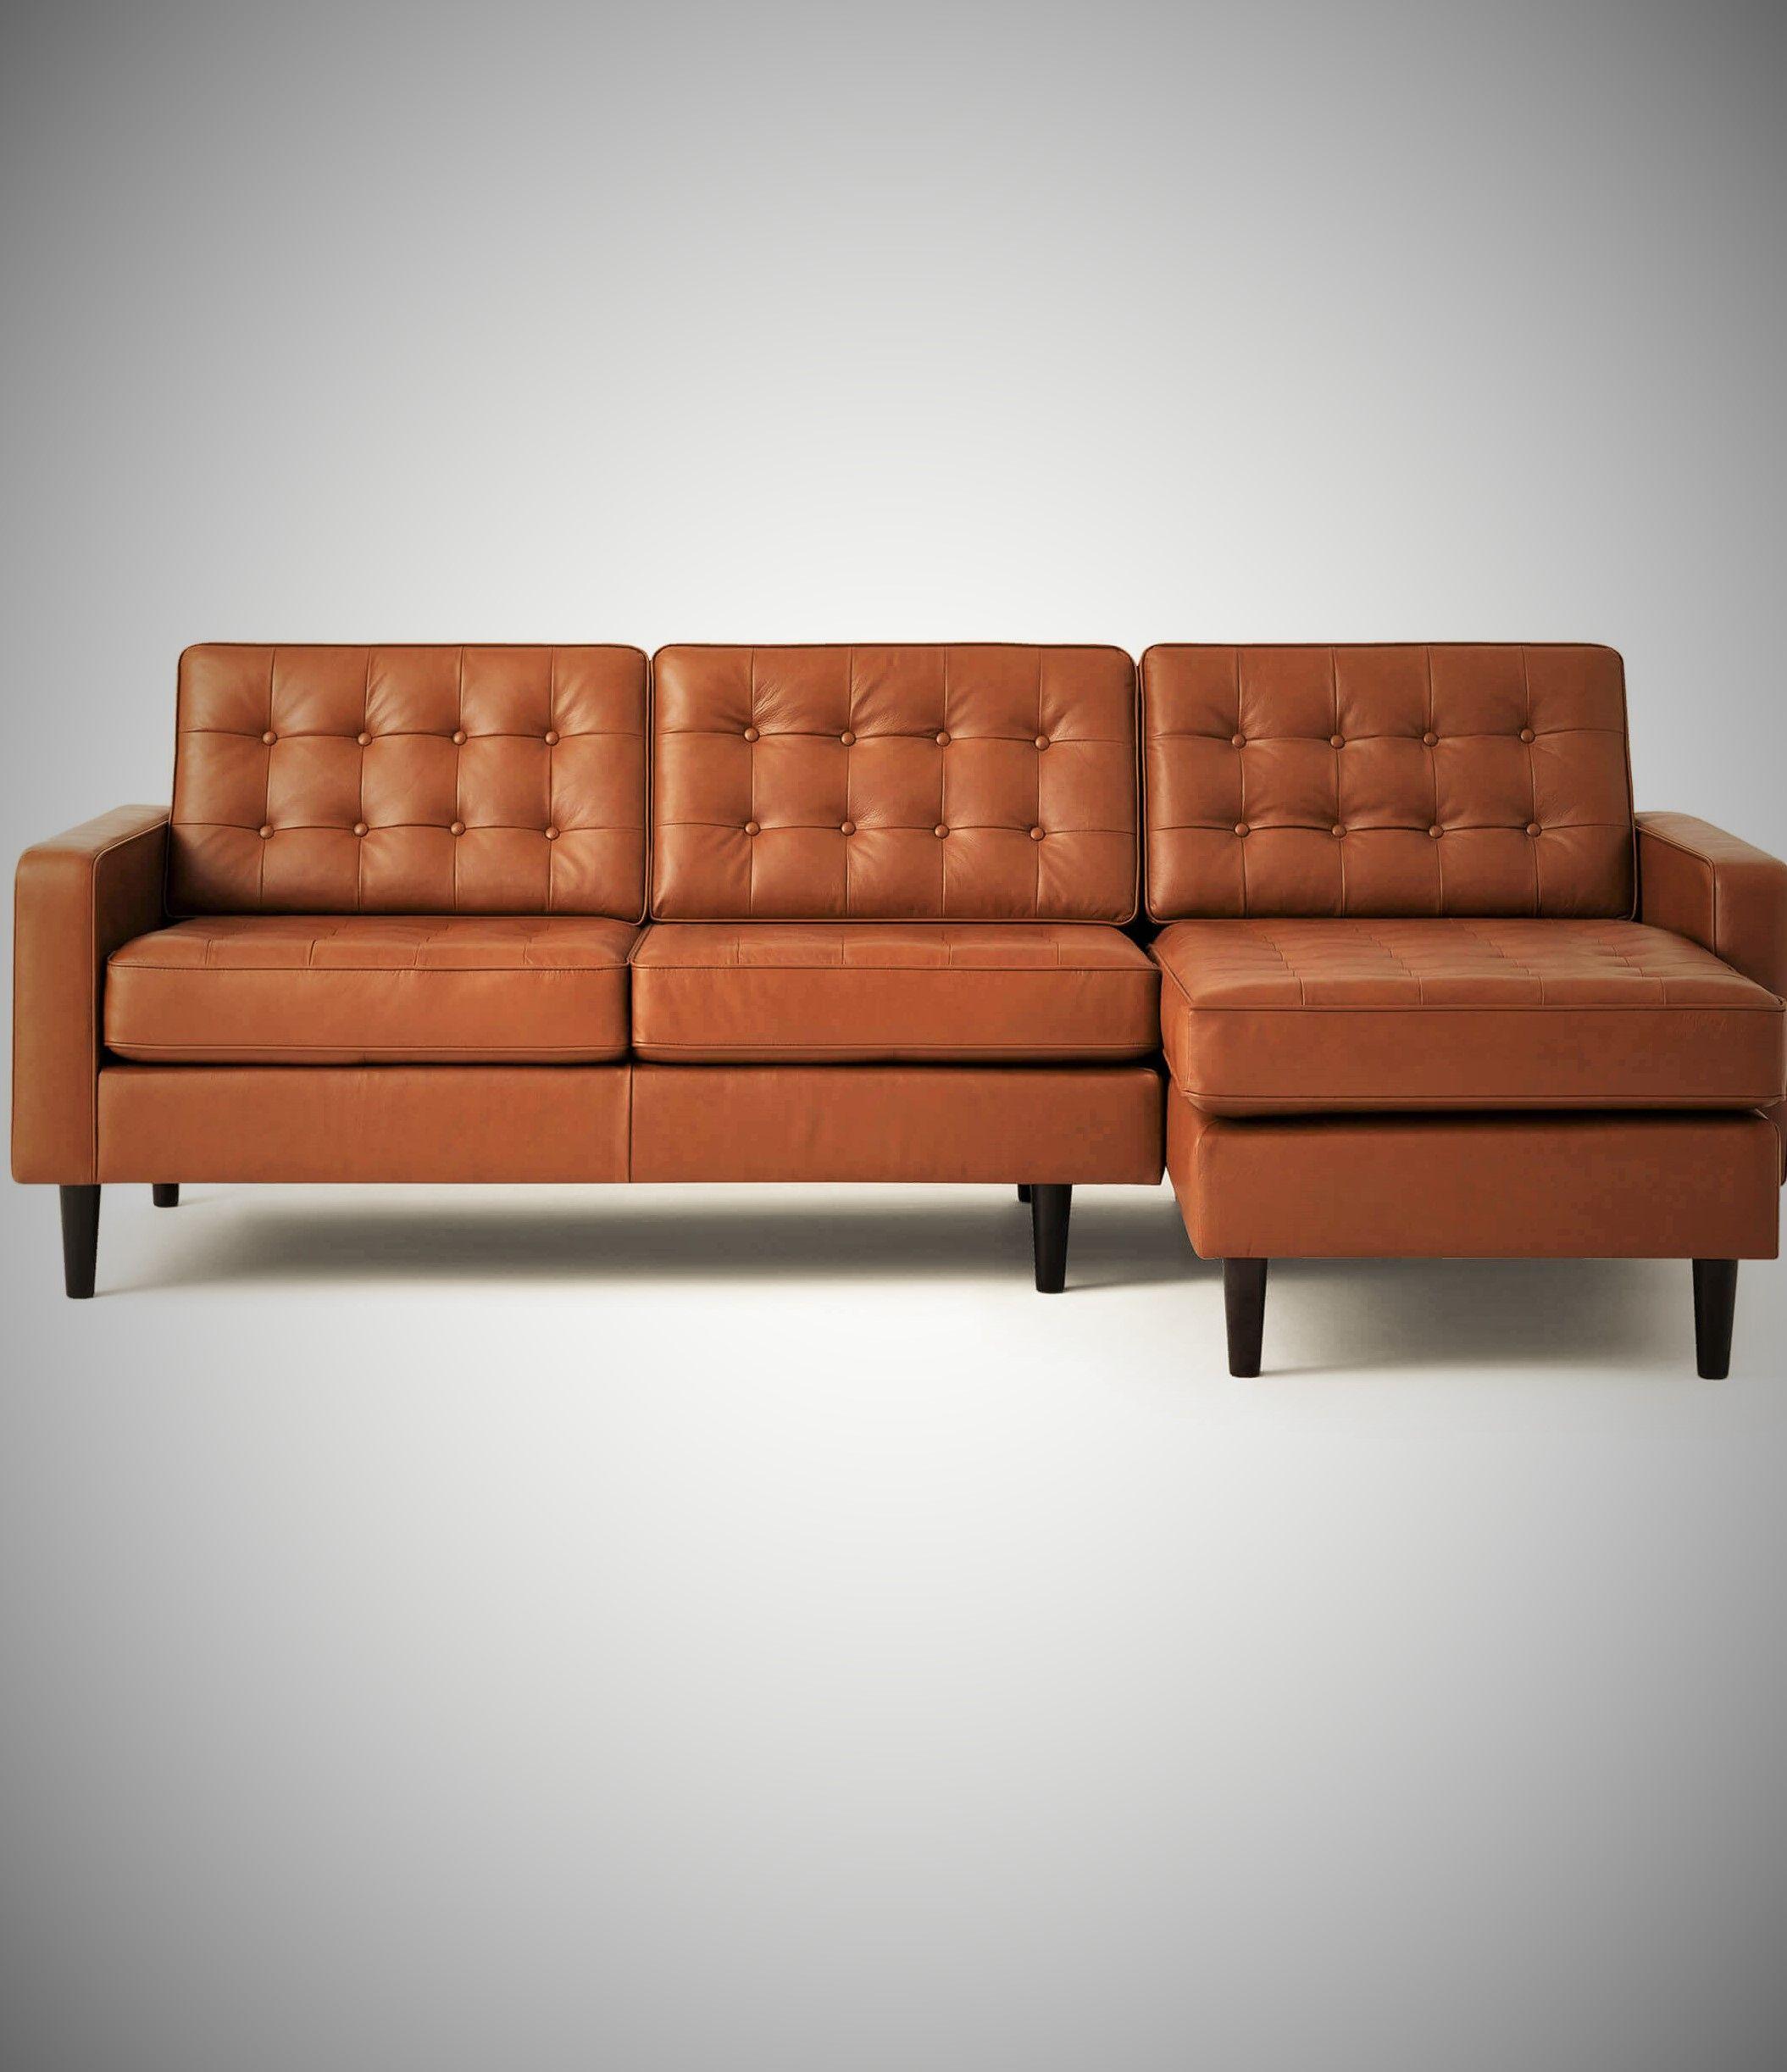 EQ3's spin on mid-century modern design, the Reverie ...